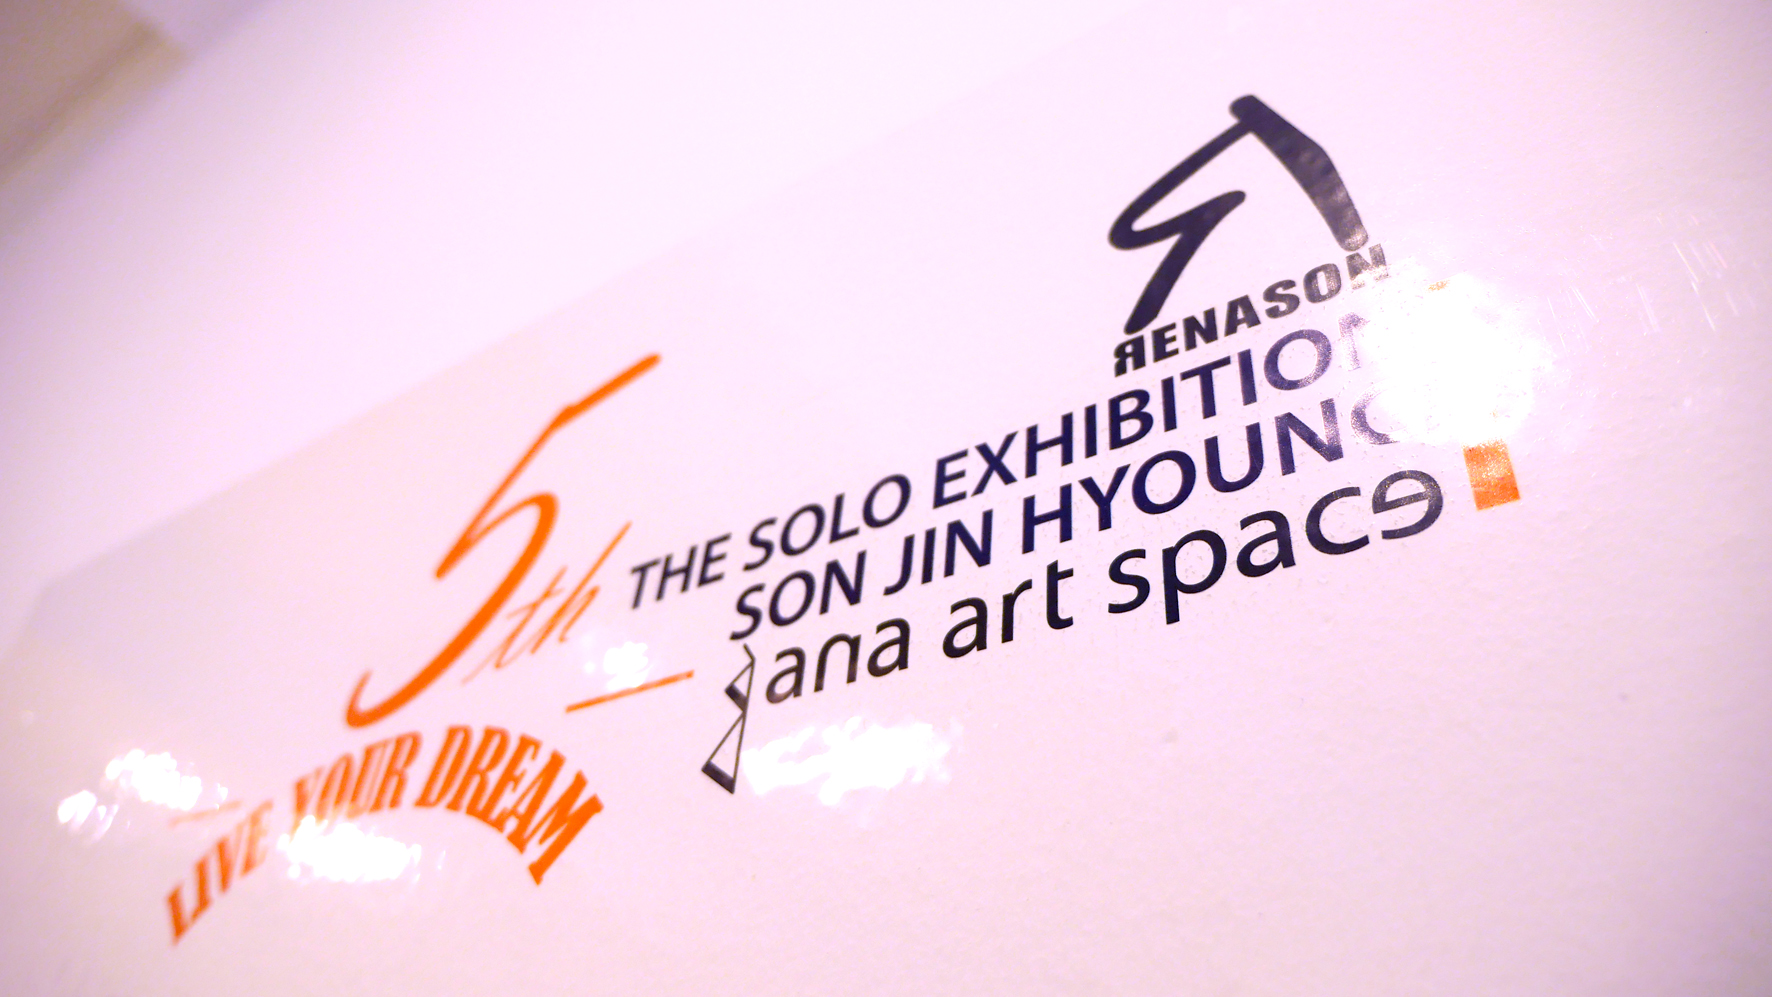 5th renason solo exhibition gana 갤러리